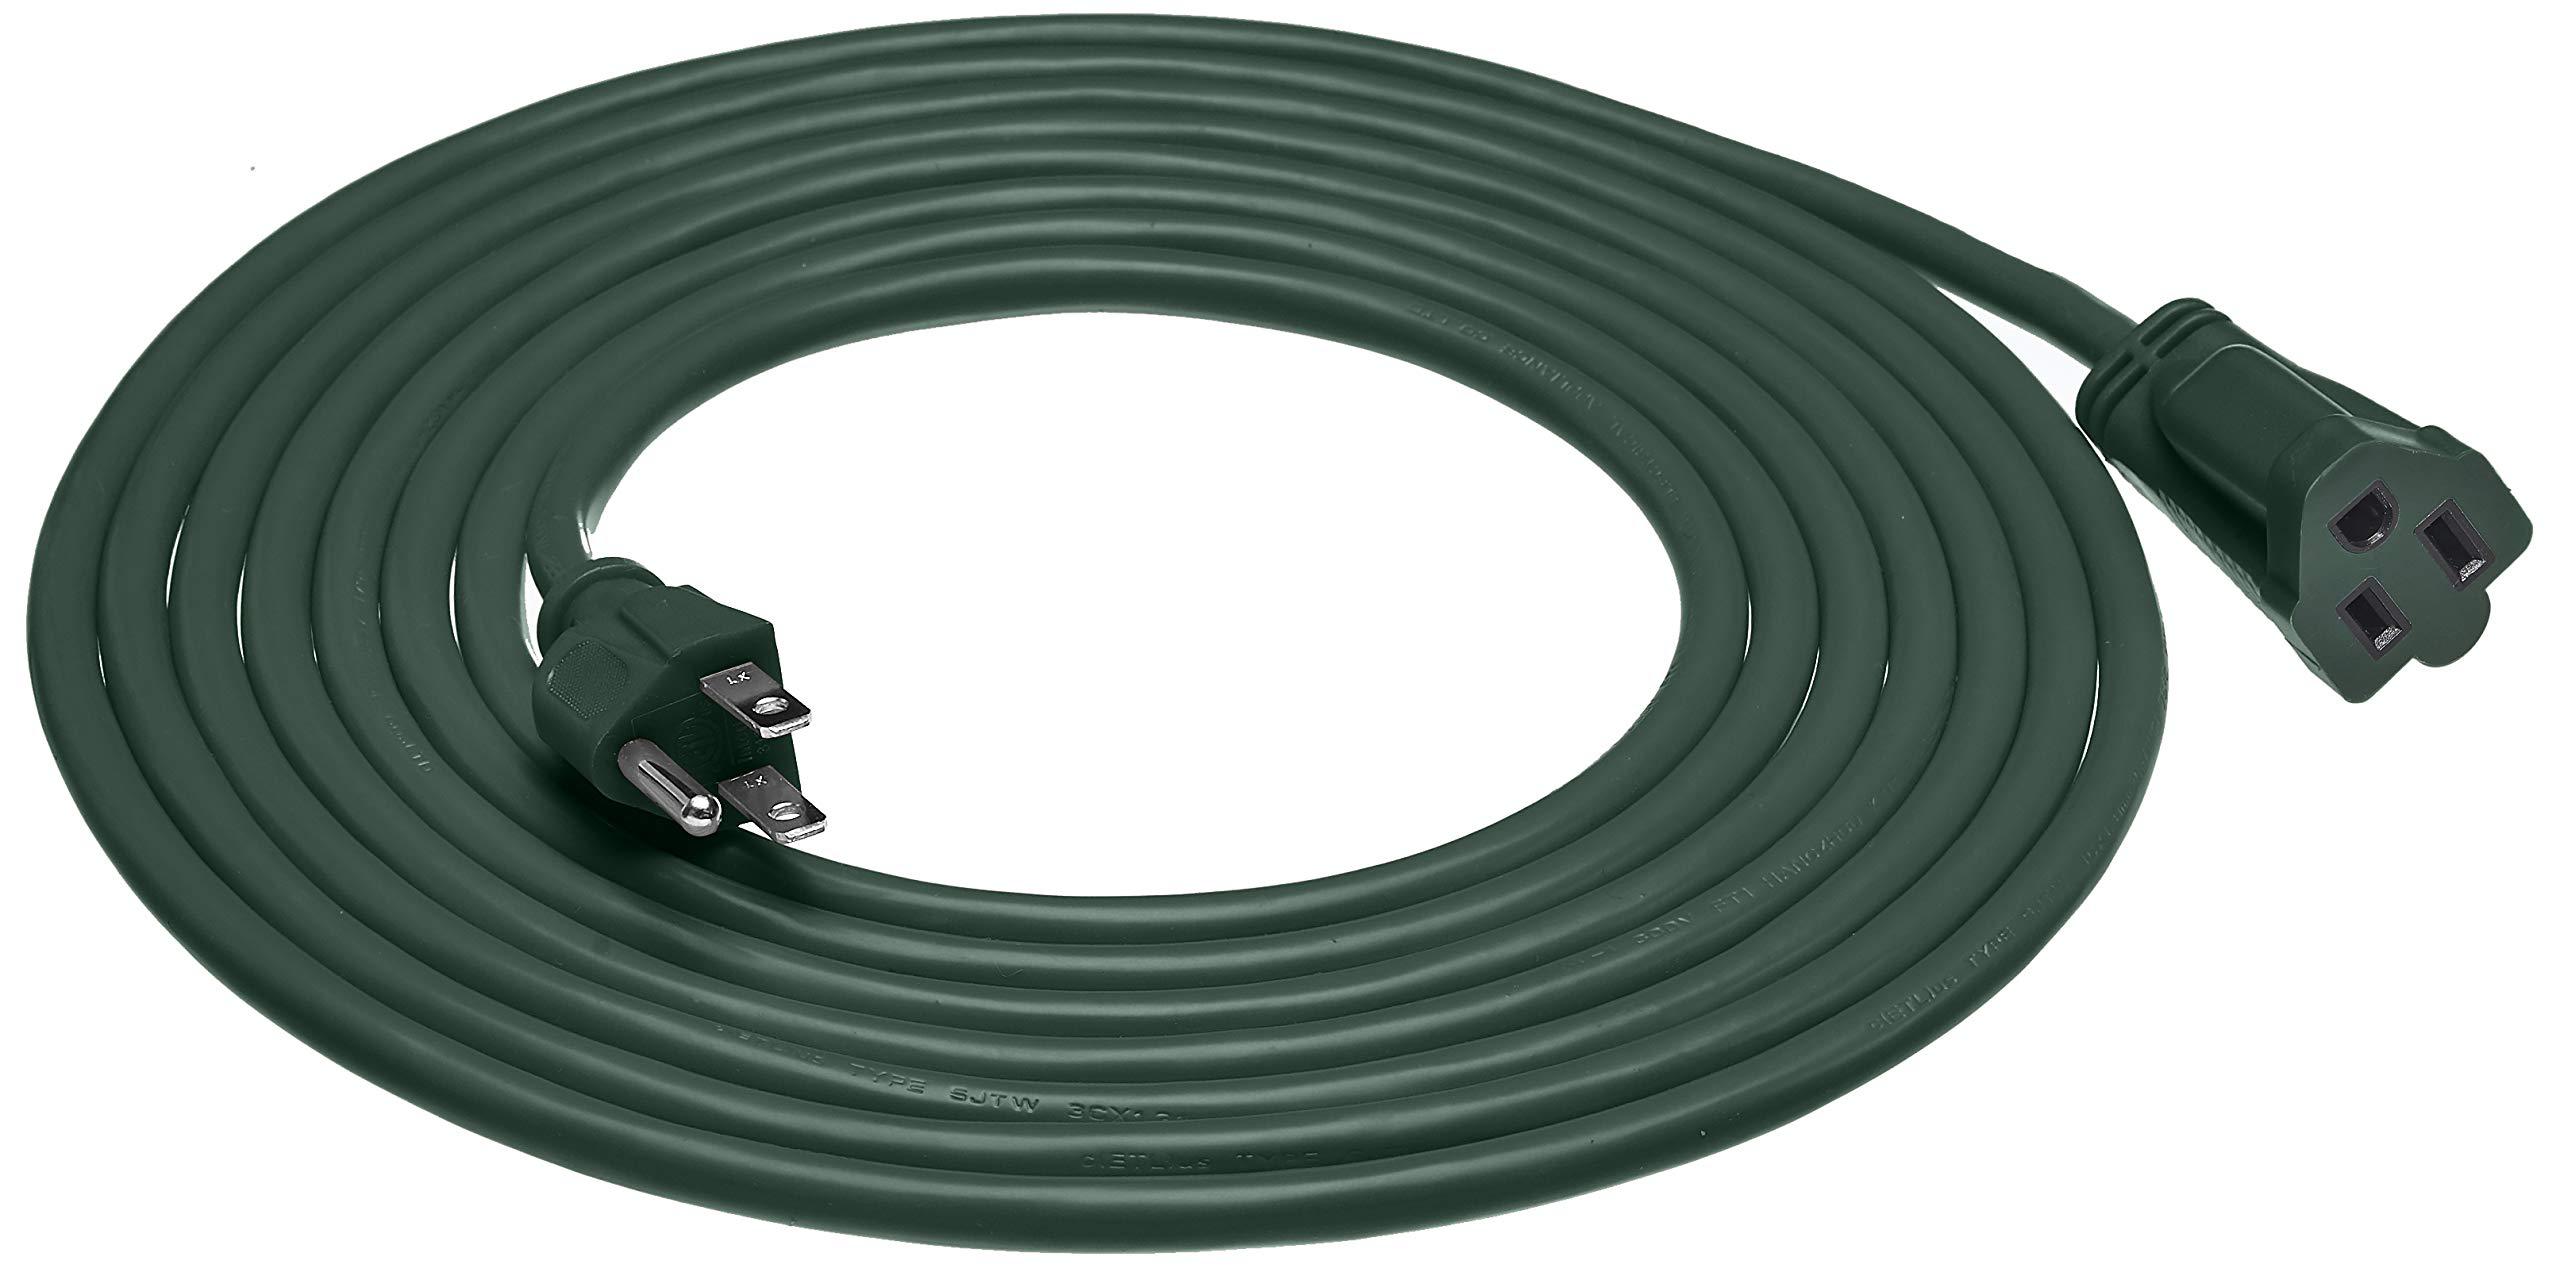 AmazonBasics 16/3 Vinyl Outdoor Extension Cord, Green, 15 Foot